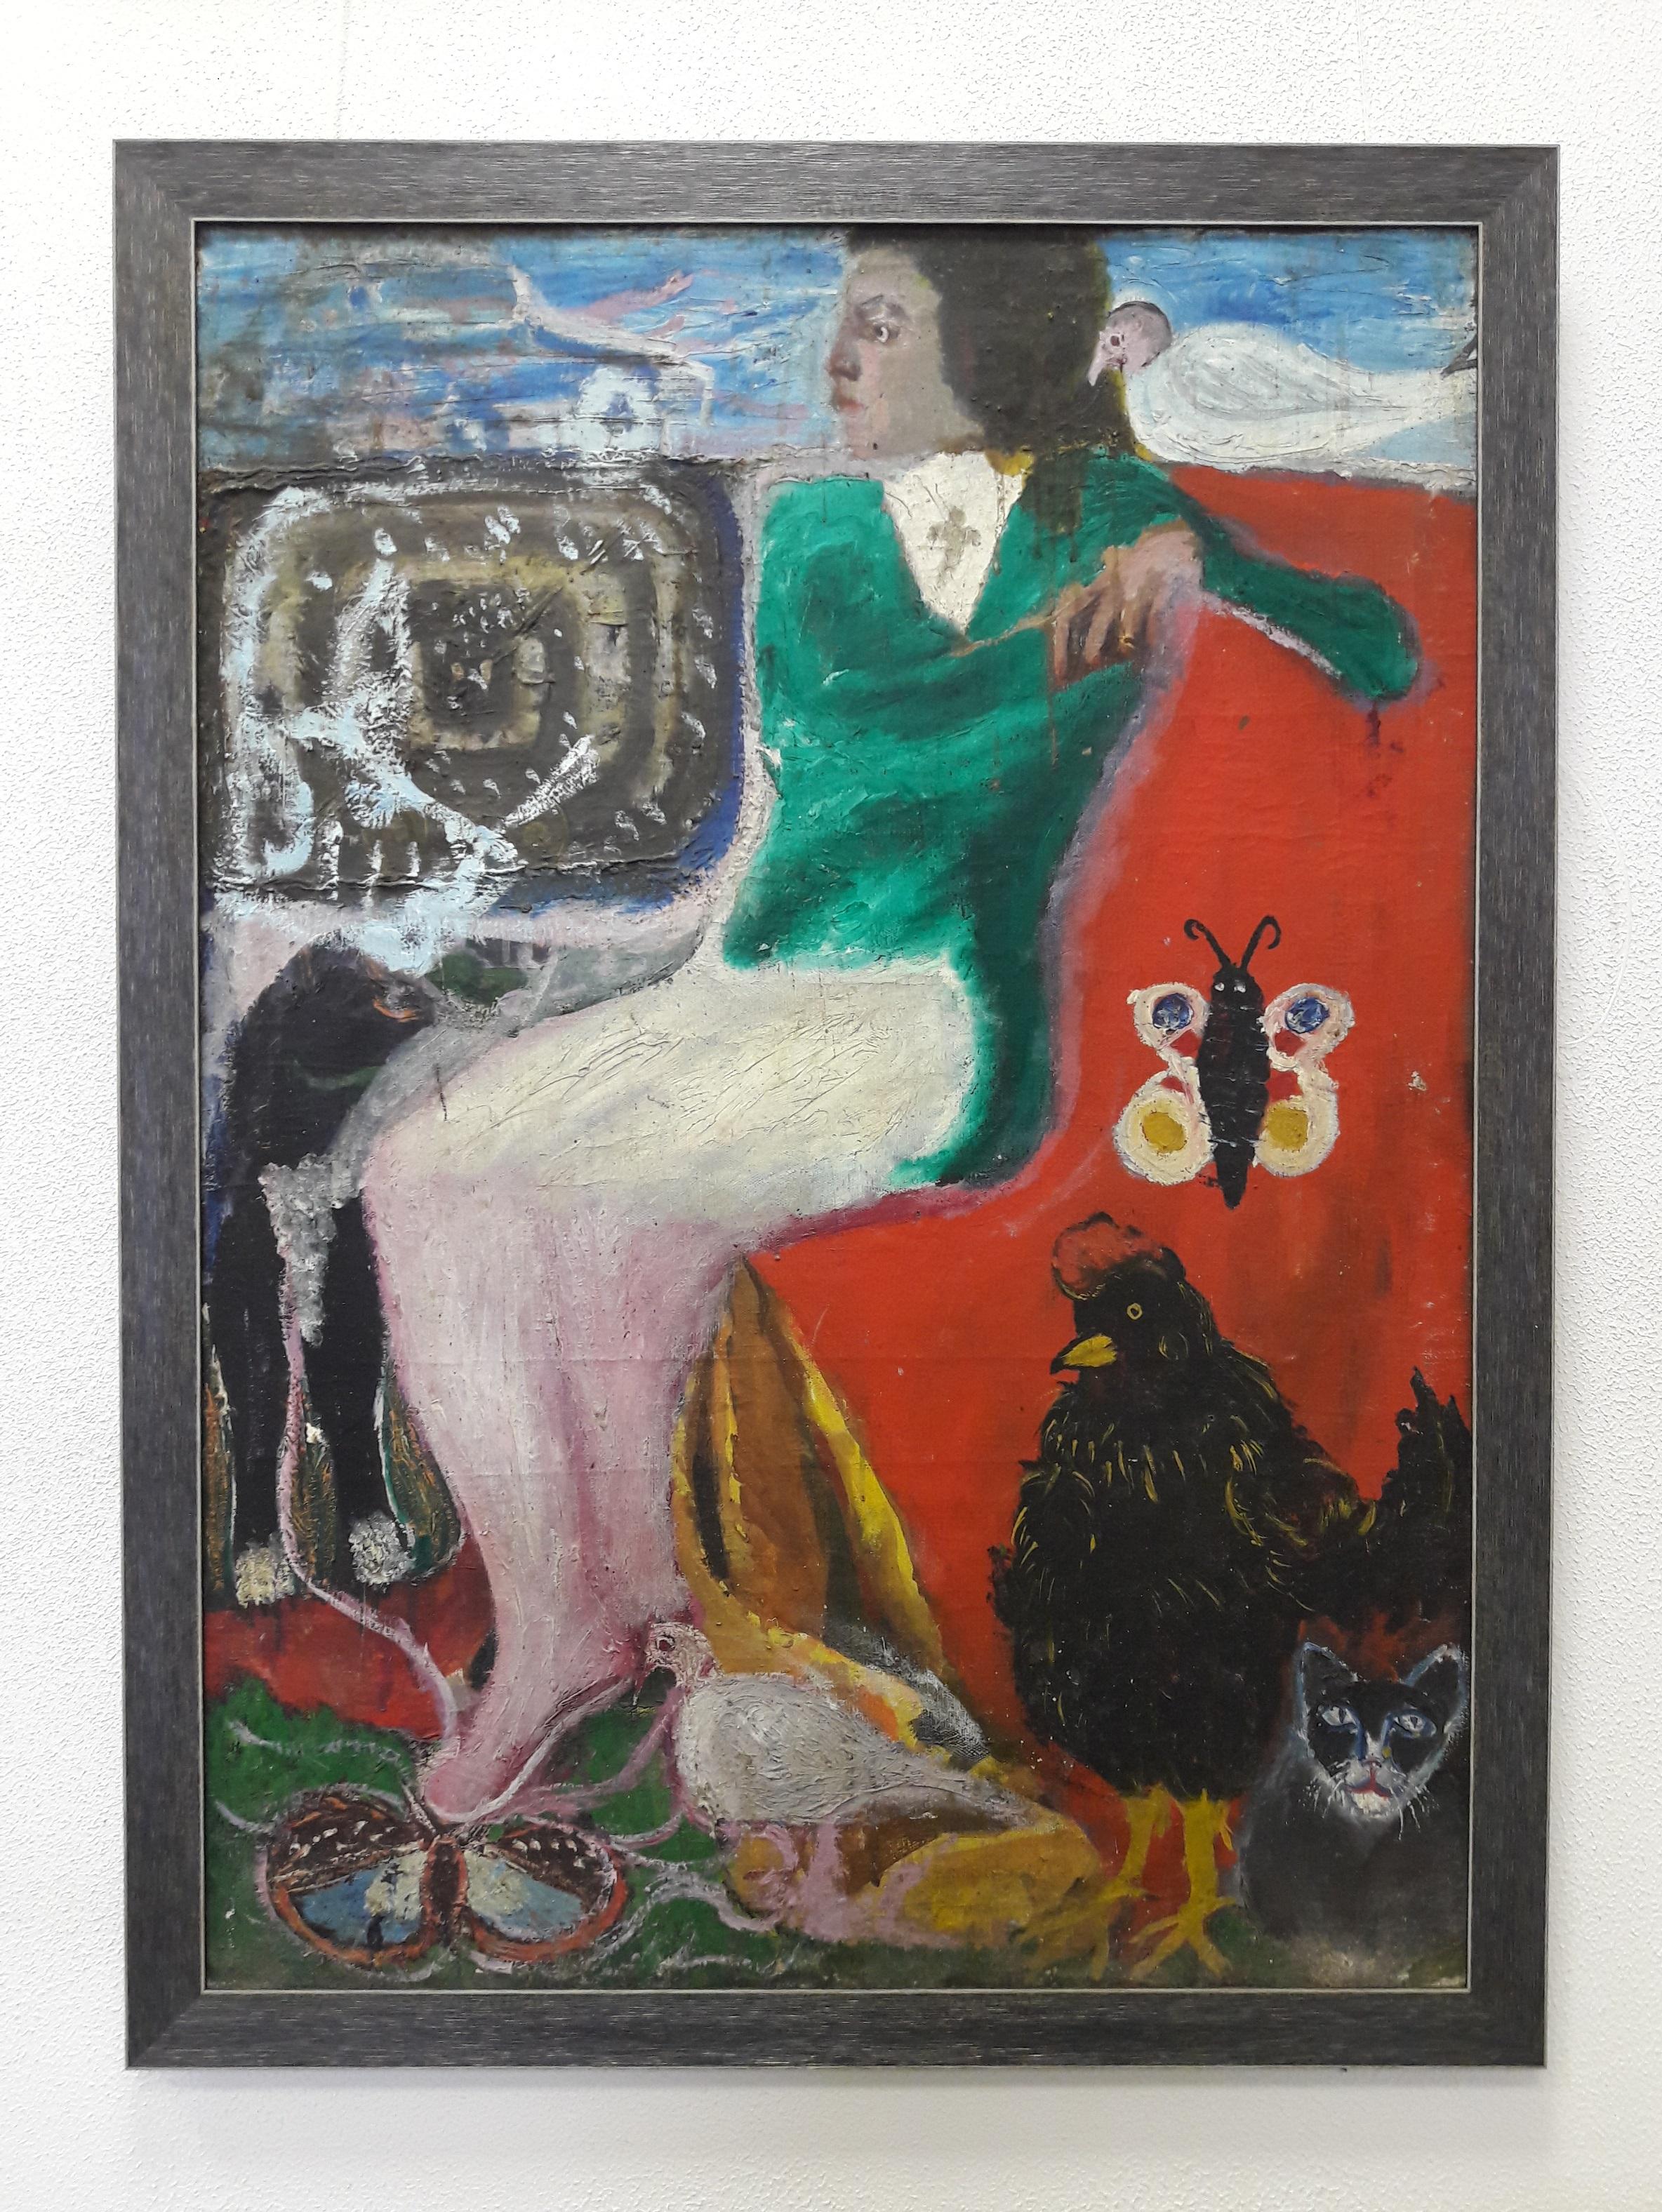 Подвойский _Волна_, км, 1992 г (92_66 см) Podvoisky _The Wave_, oil on cardboard, 1992 (92 _ 66 cm)